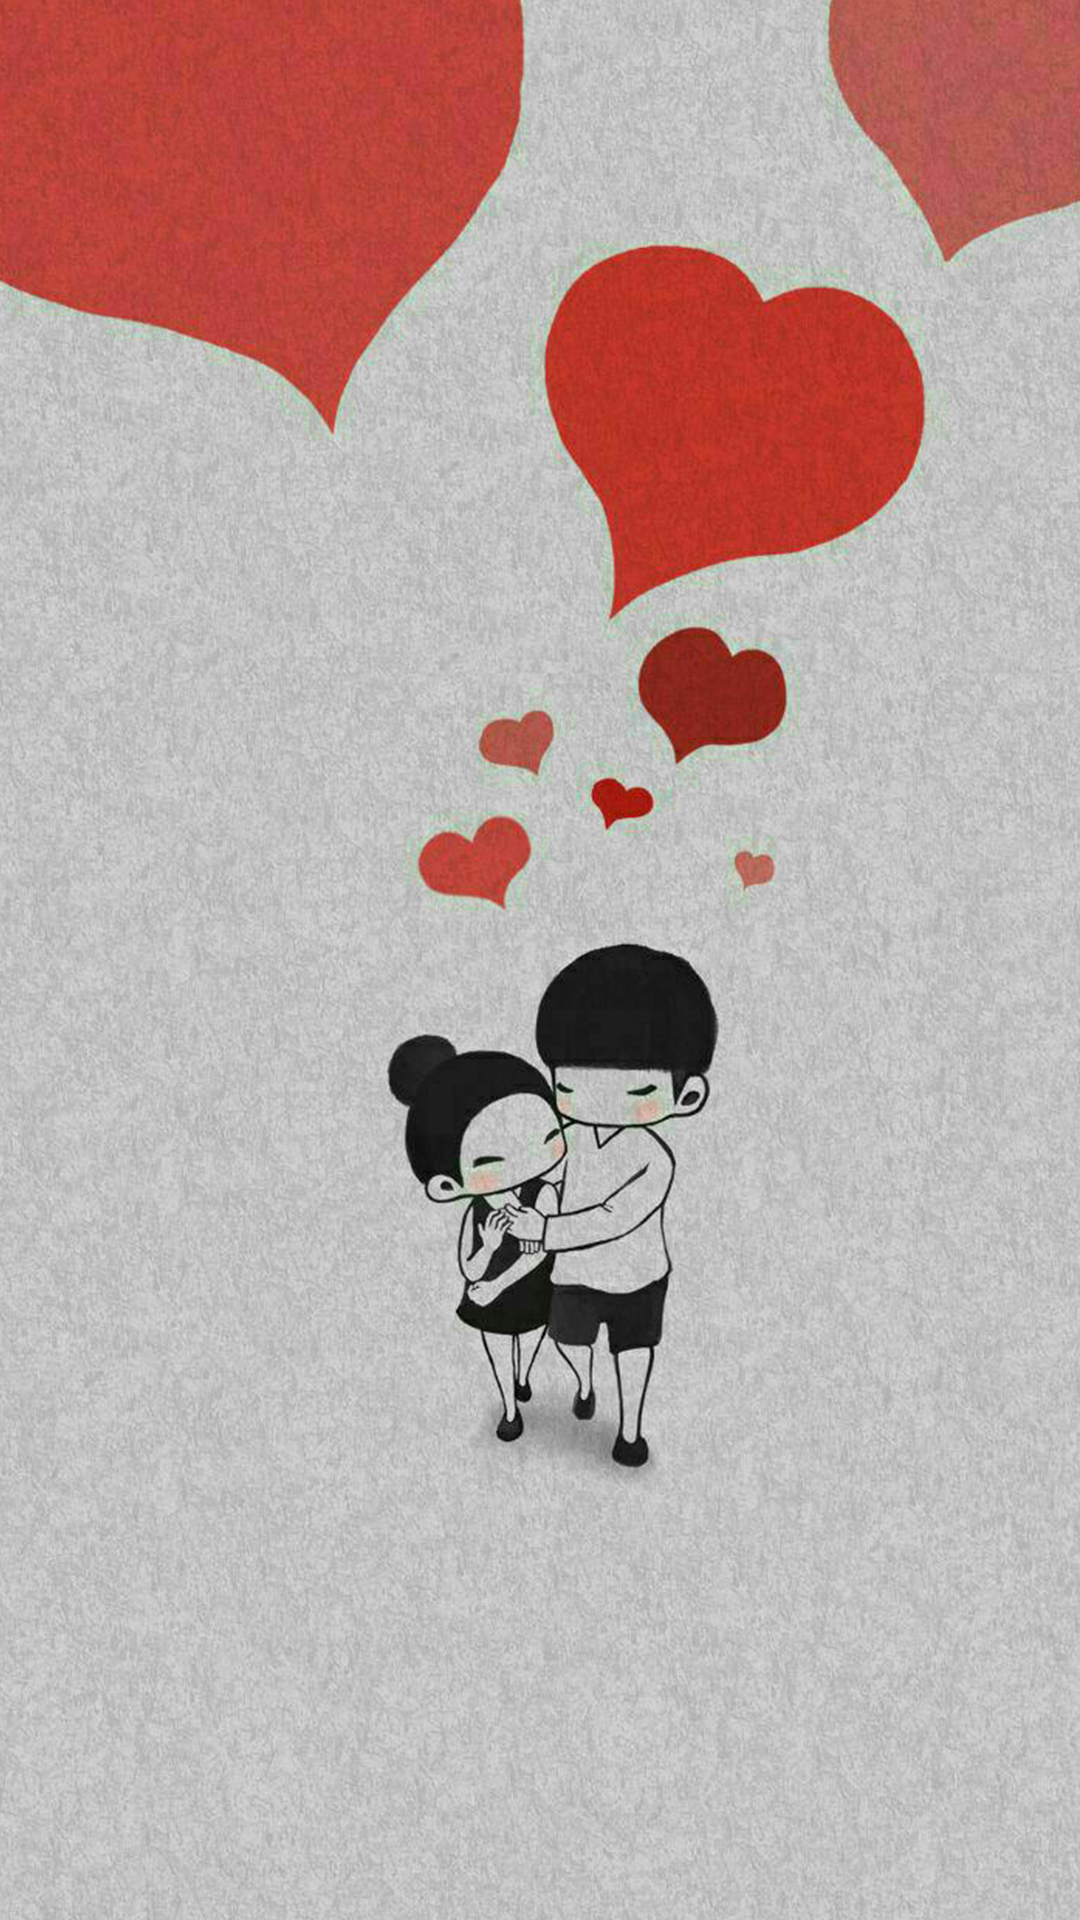 والپیپر عاشقانه